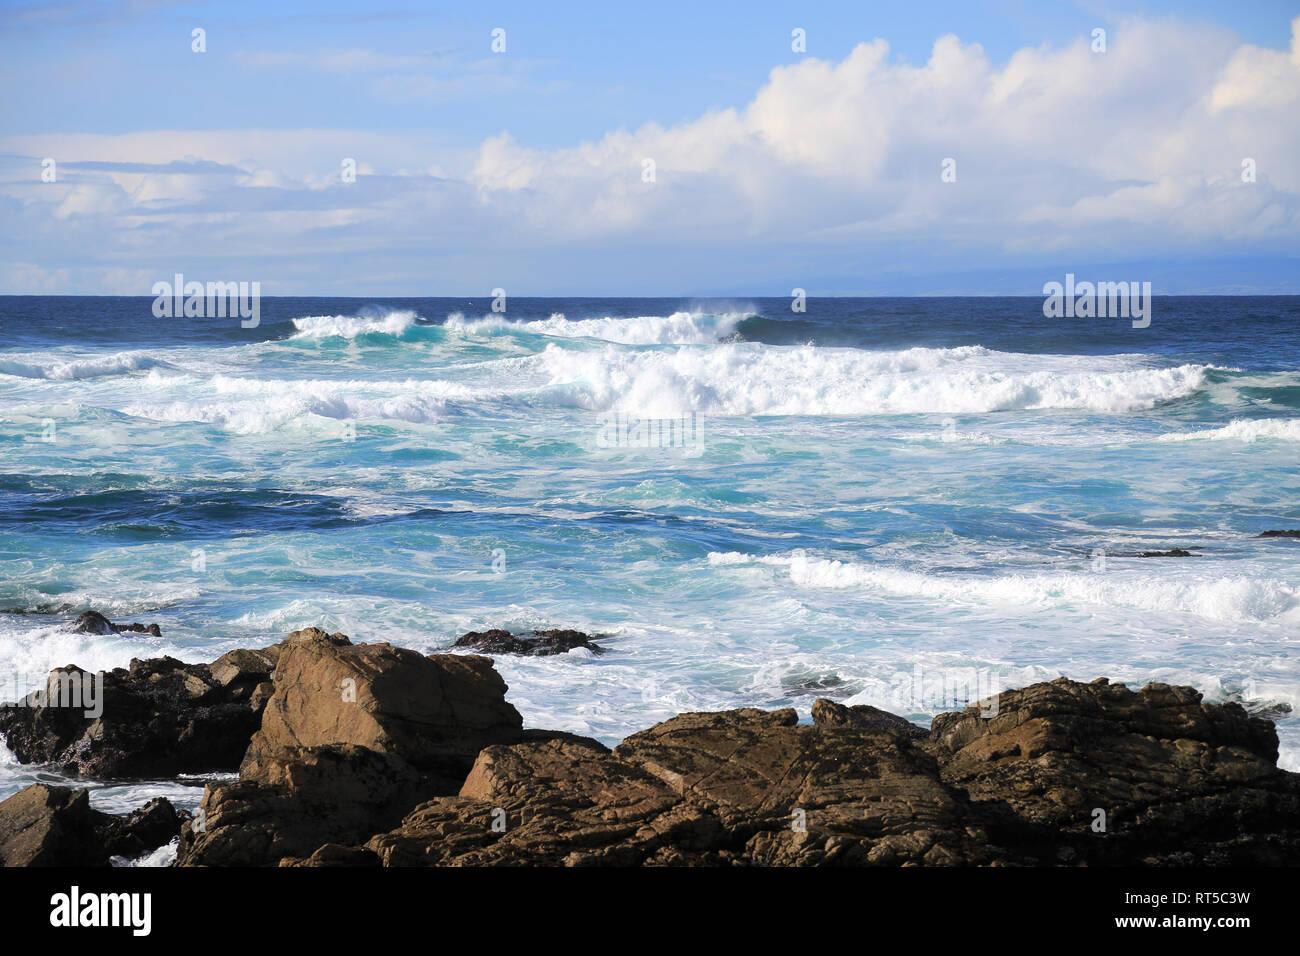 17 Mile Drive, Rocky Coastline, Pebble Beach, Monterey Peninsula, Pacific Ocean, California, USA - Stock Image